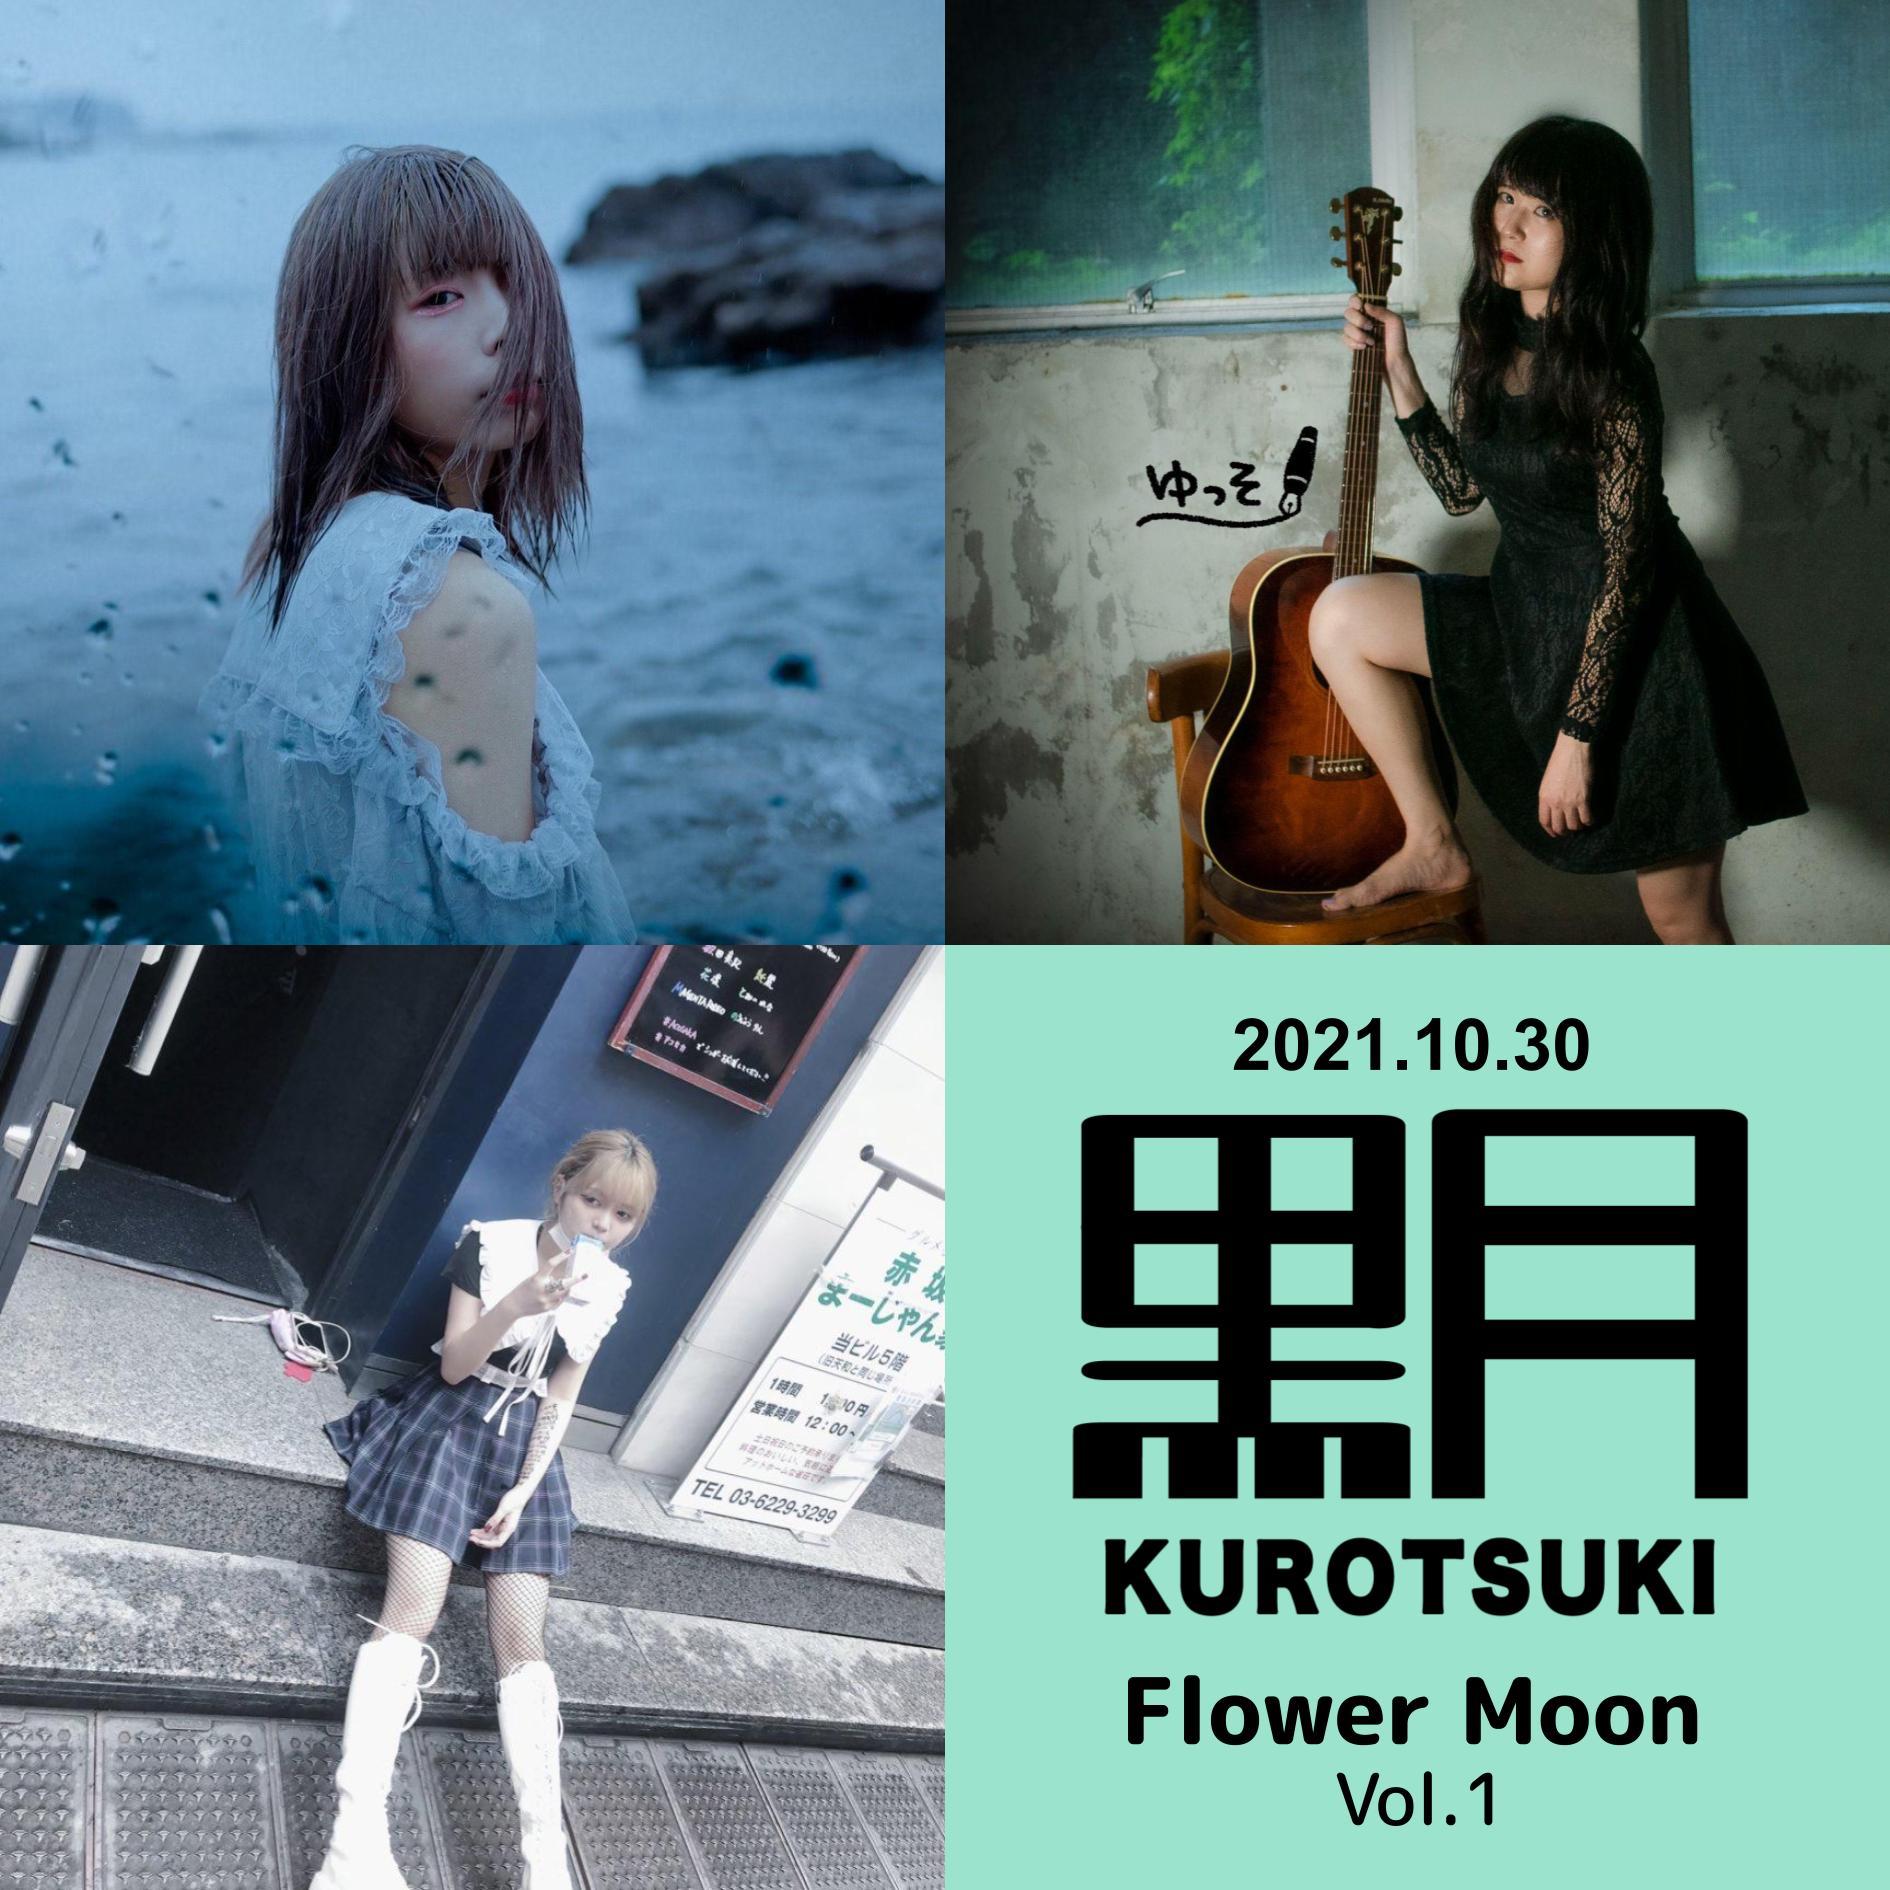 Flower Moon vol.1